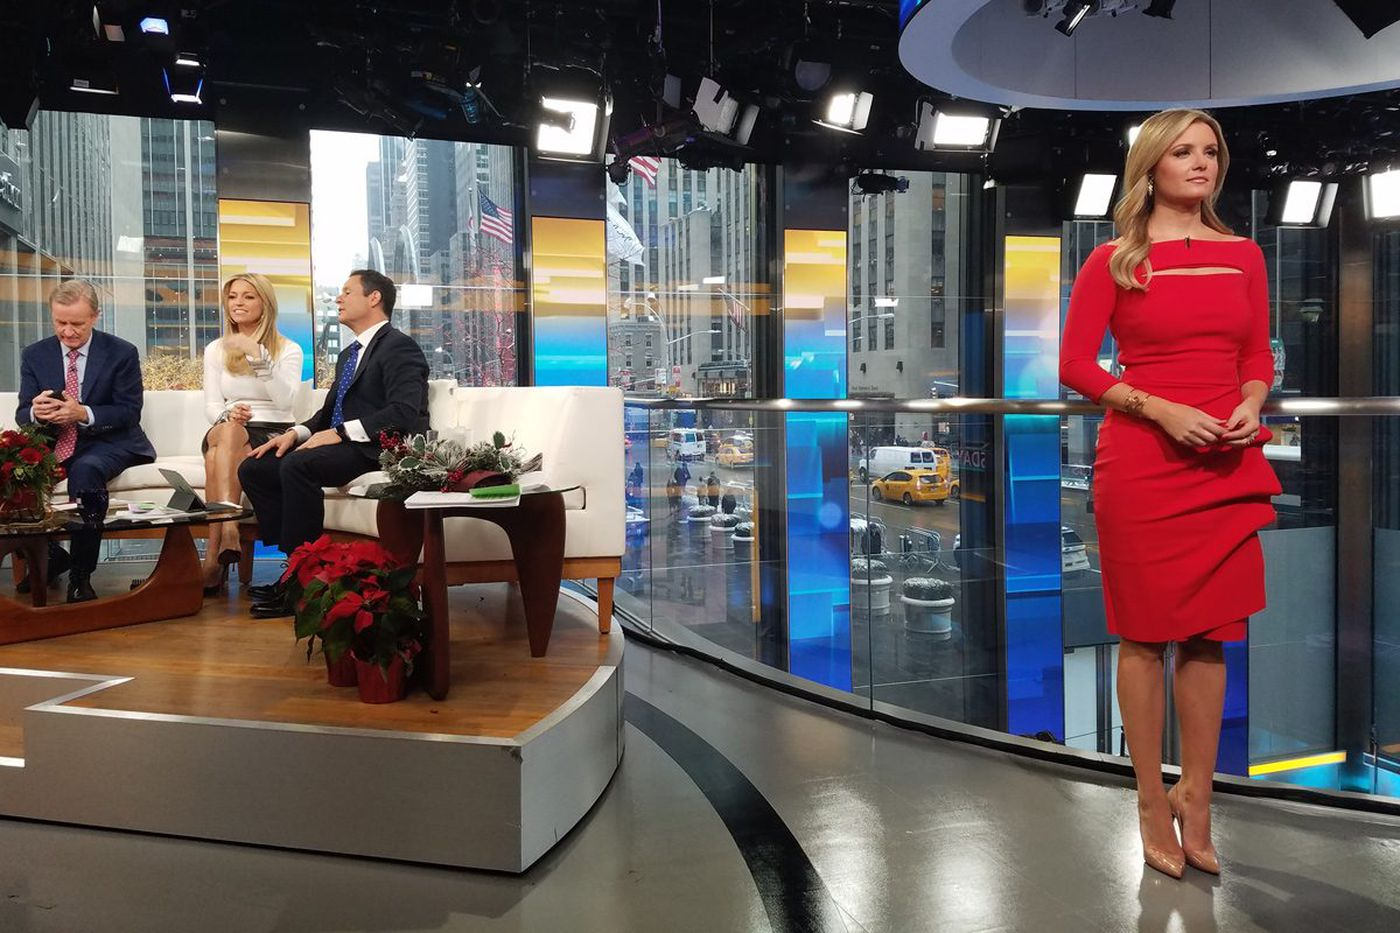 Jillian Mele: A day in the life of a Fox News host